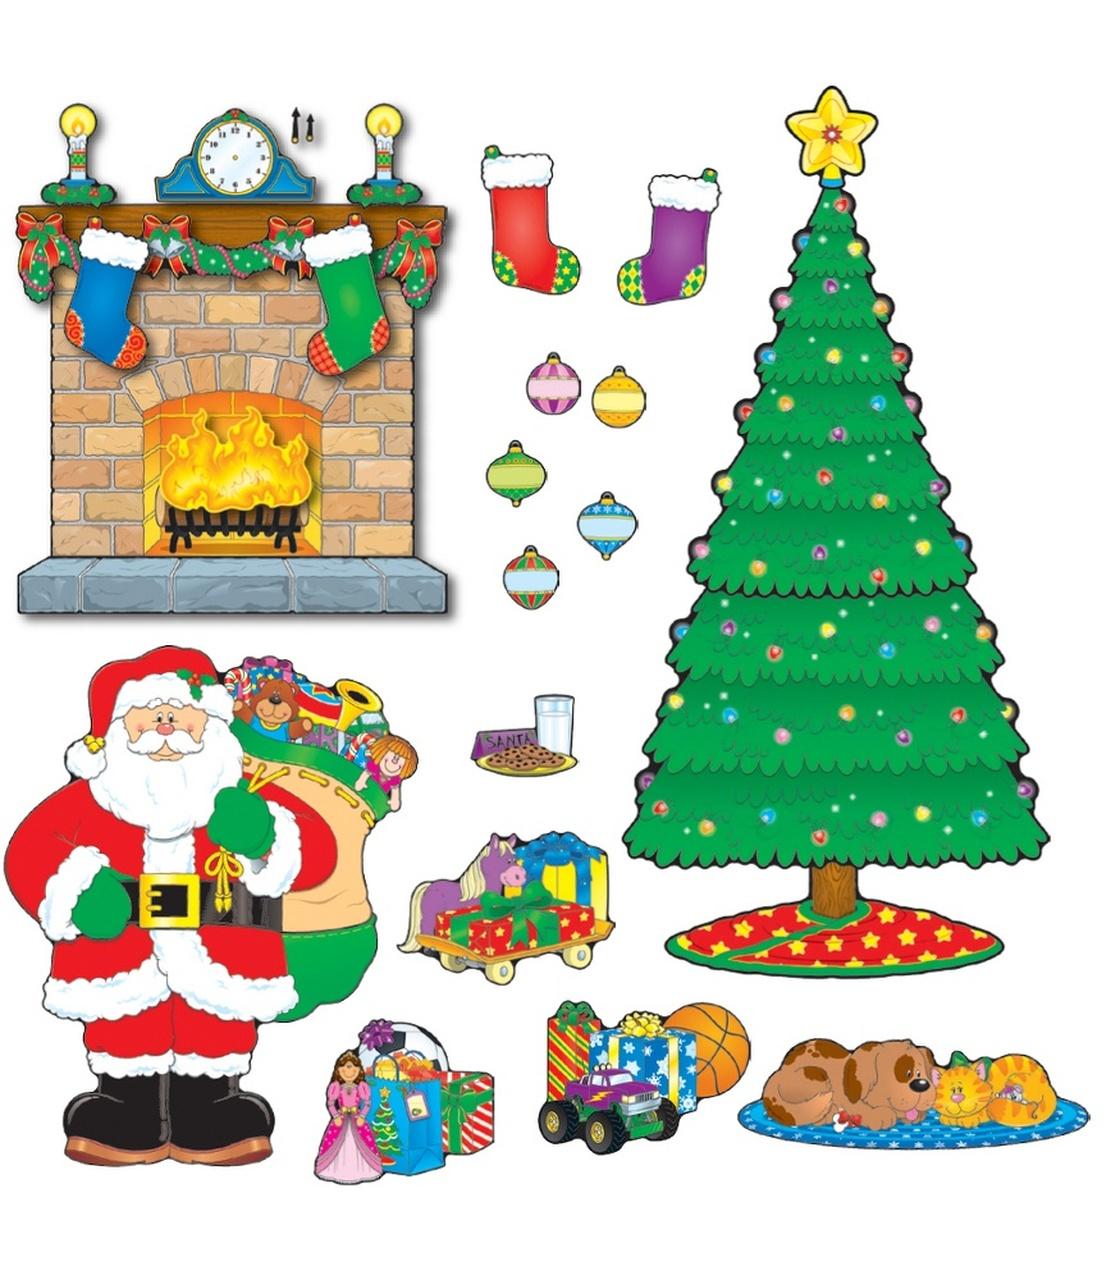 Christmas Scene Bulletin Board Set image free